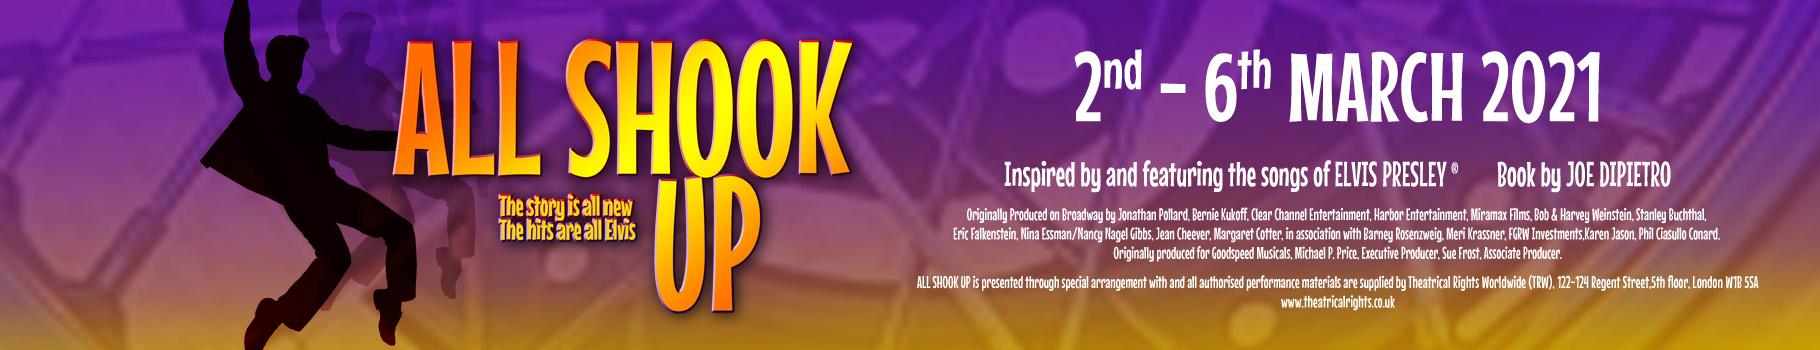 21-03 All Shook Up LAOS Web Banner